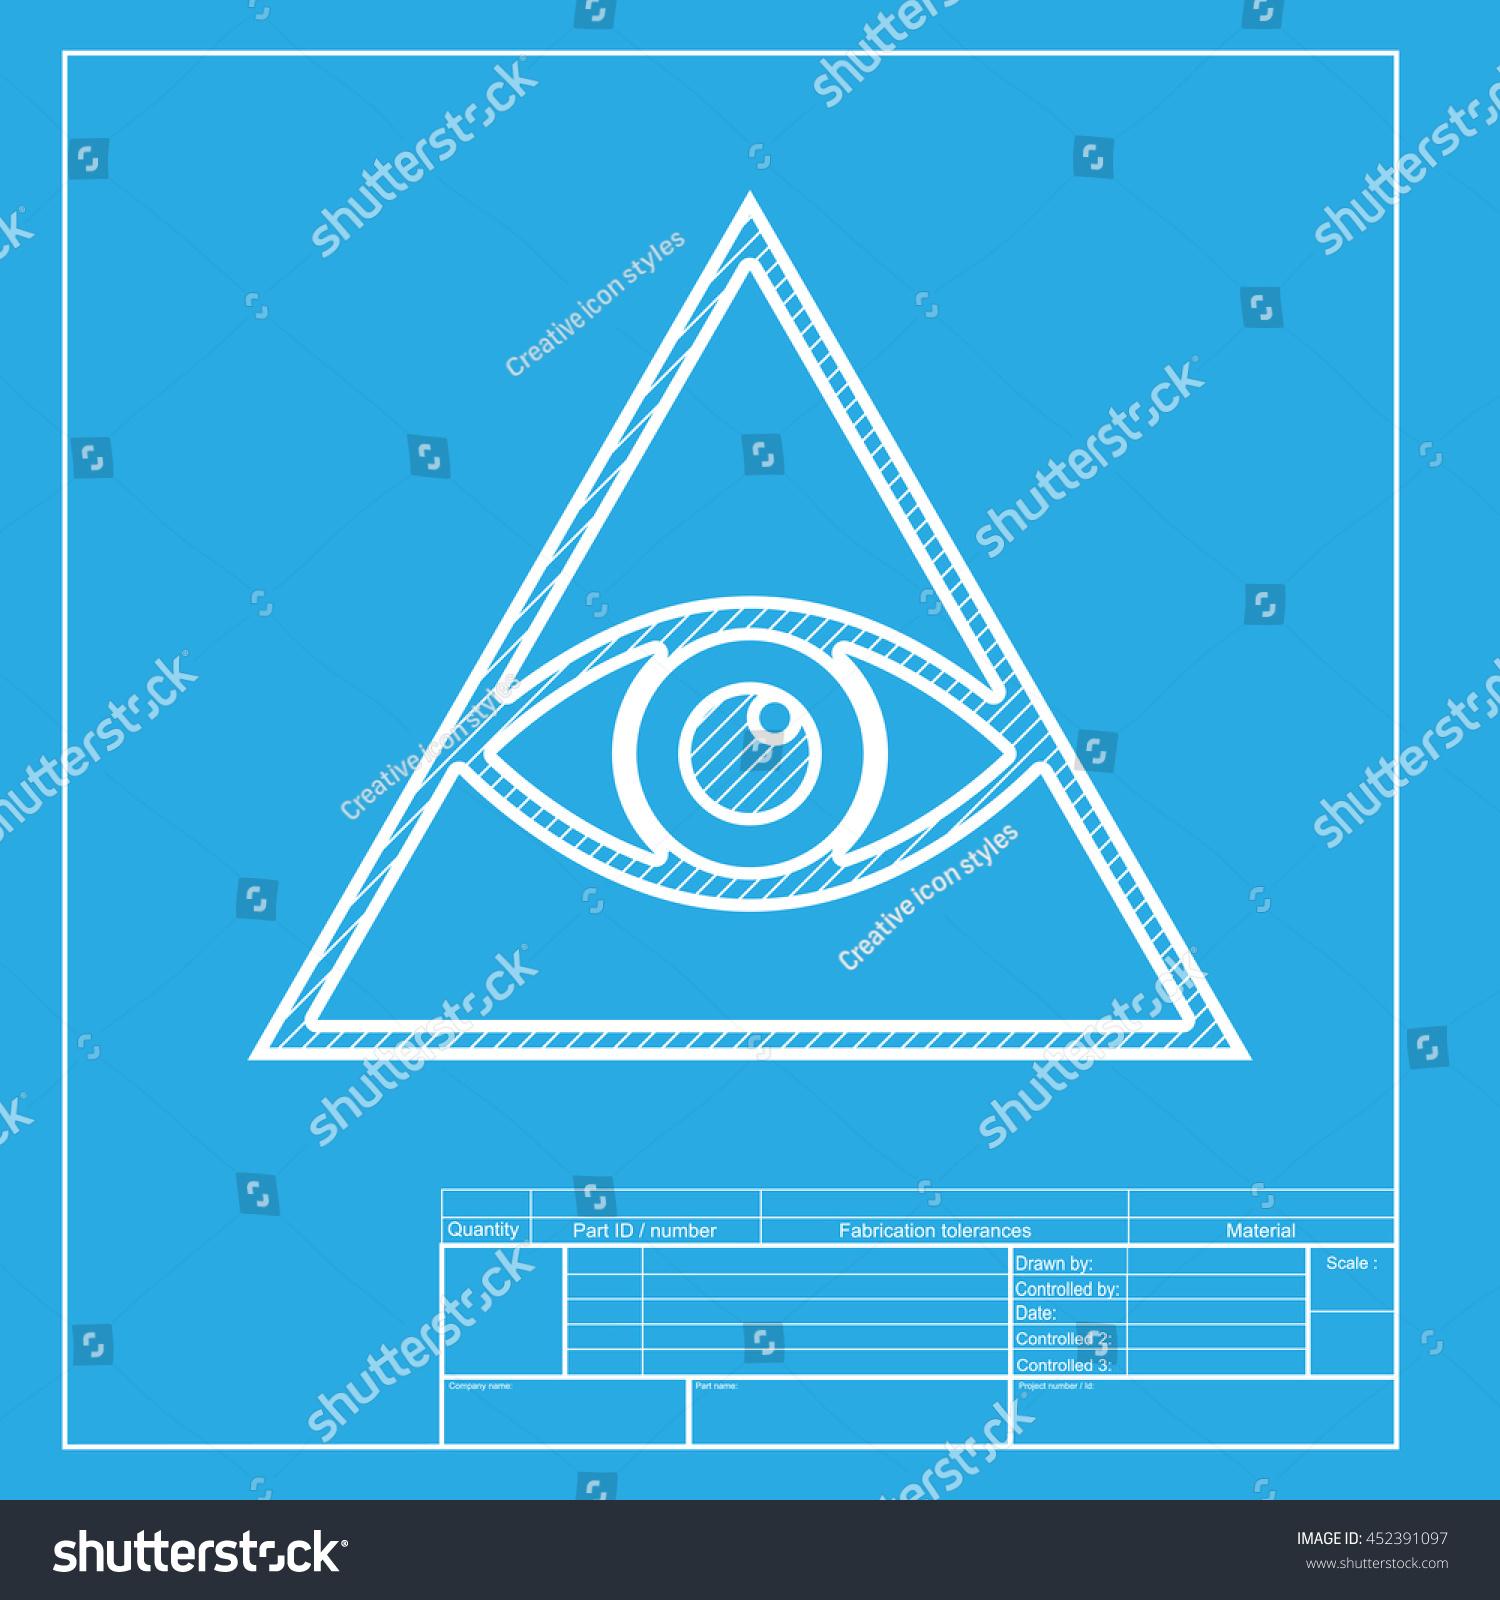 All seeing eye pyramid symbol freemason stock illustration all seeing eye pyramid symbol freemason stock illustration 452391097 shutterstock malvernweather Gallery